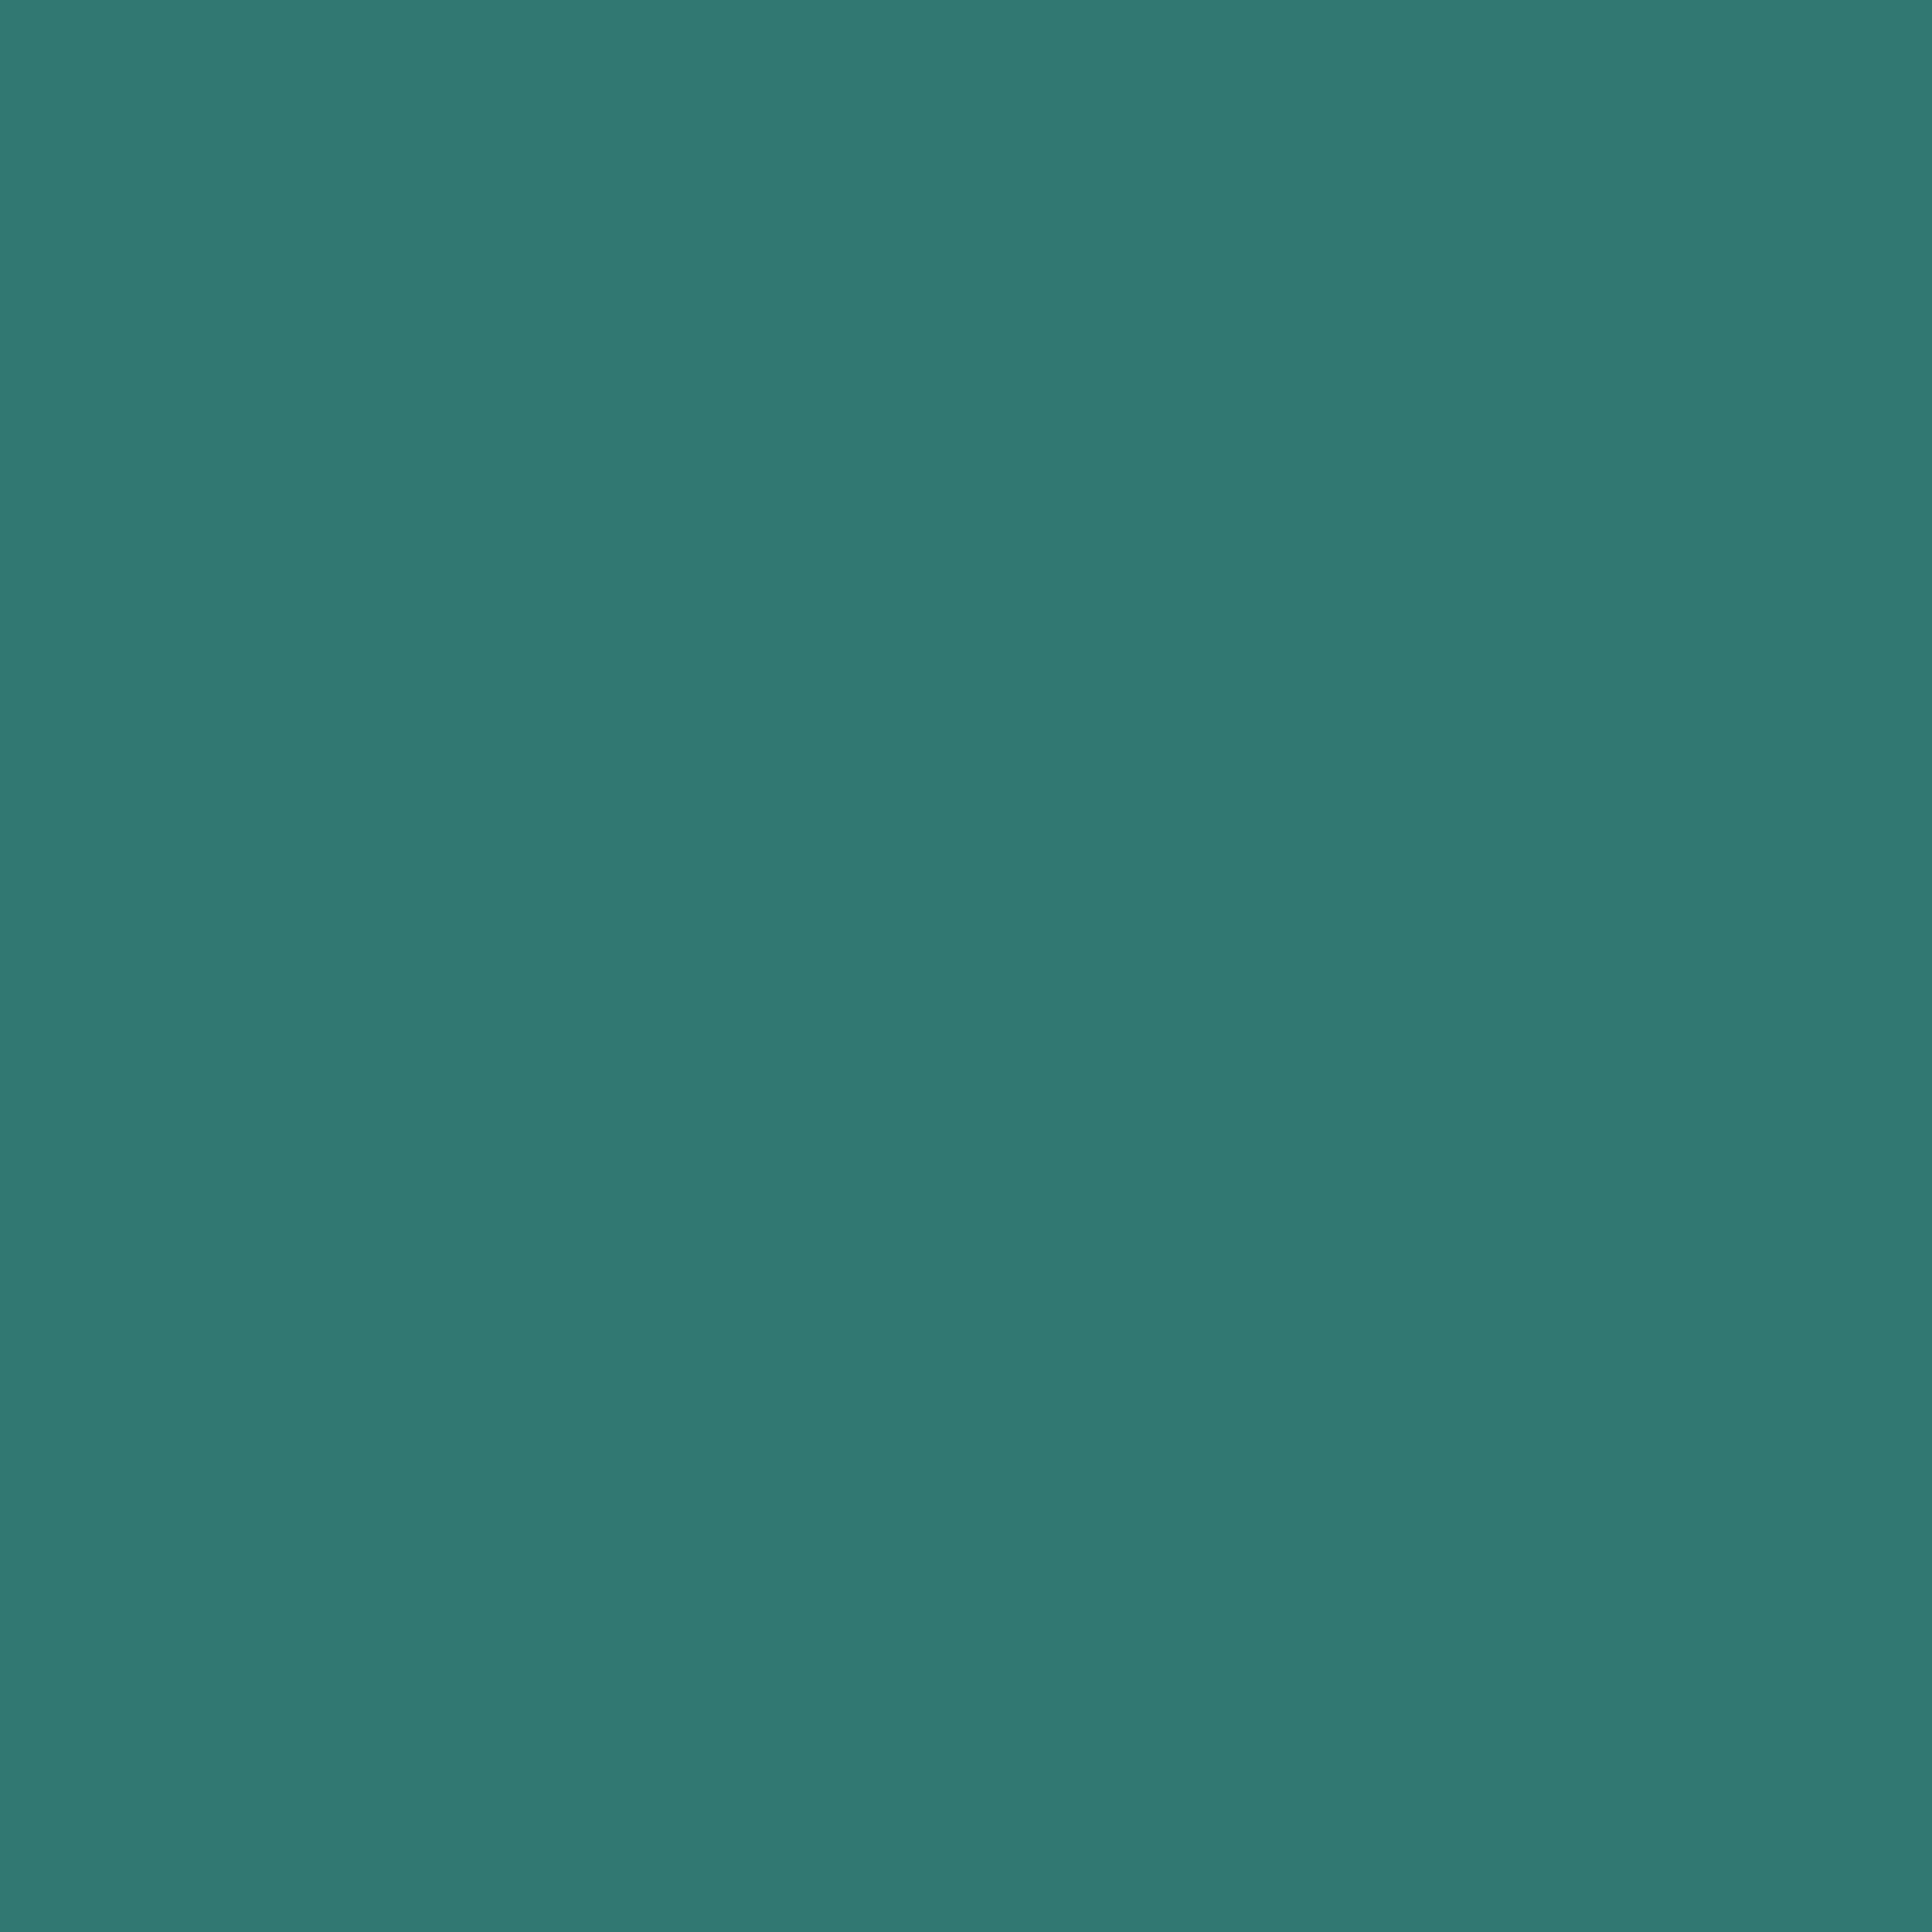 2048x2048 Myrtle Green Solid Color Background